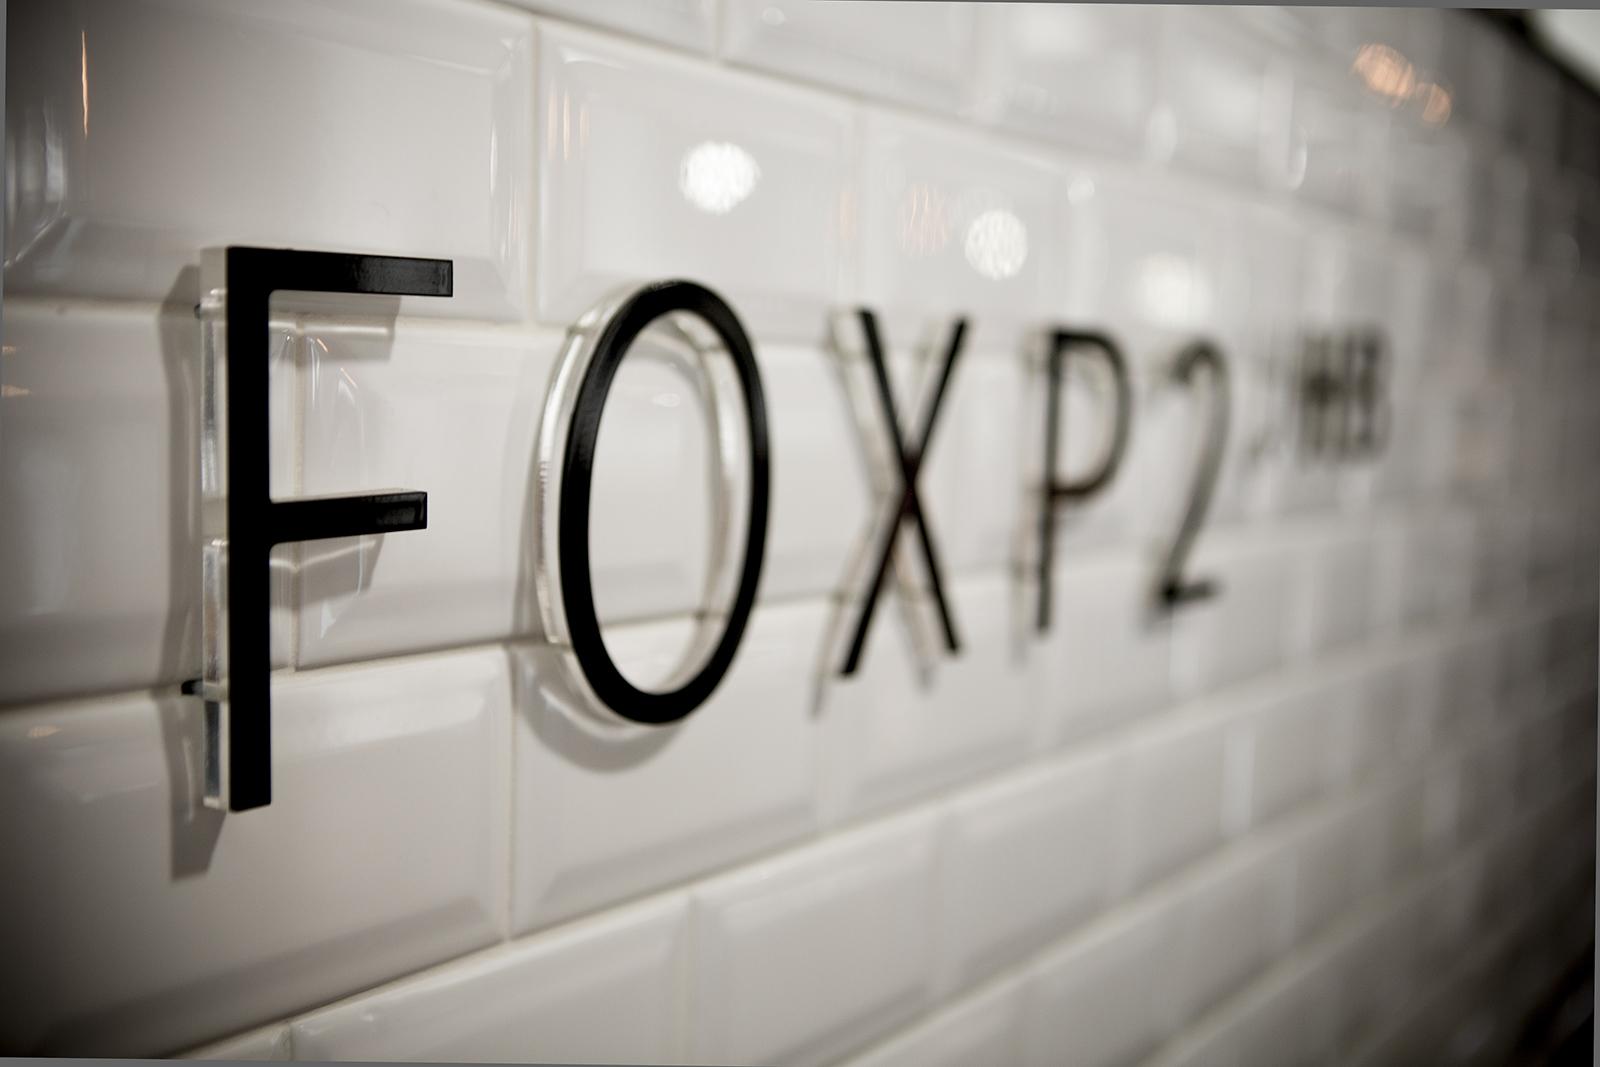 fox-p2-2